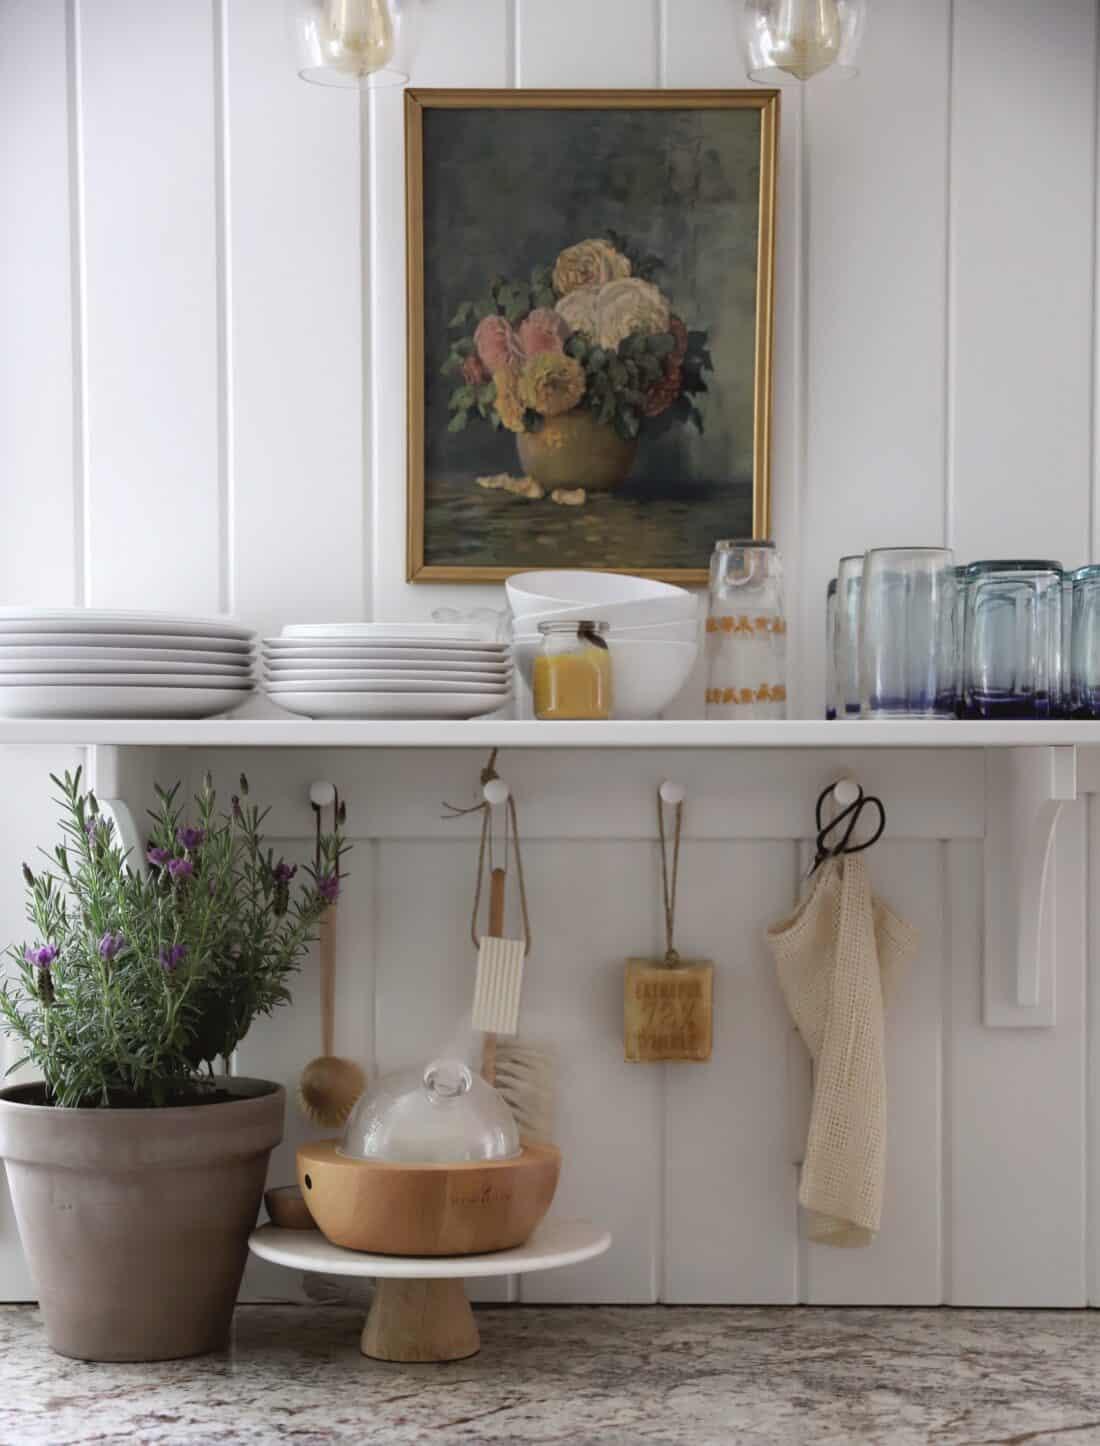 lavender plant and aria diffuser in kitchen